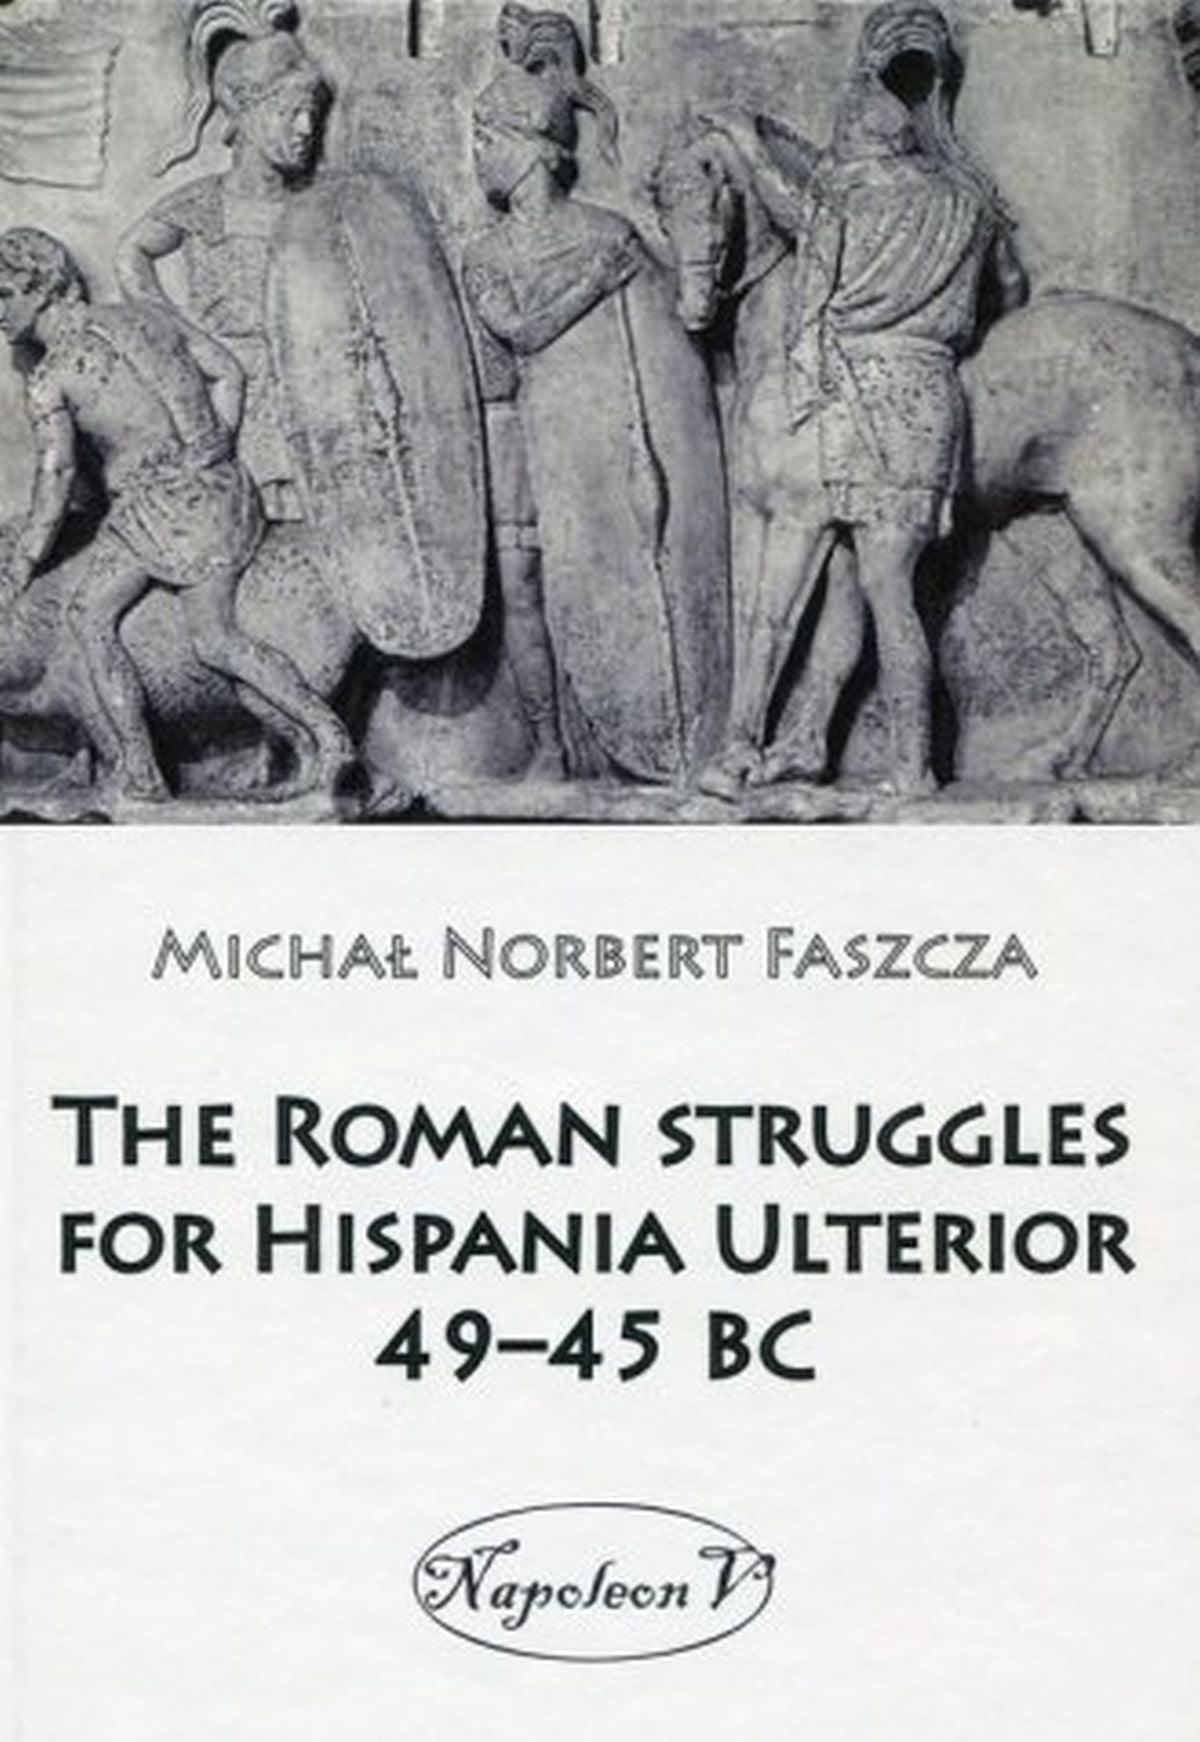 The Roman struggles for Hispania Ulterior 49-45 BC